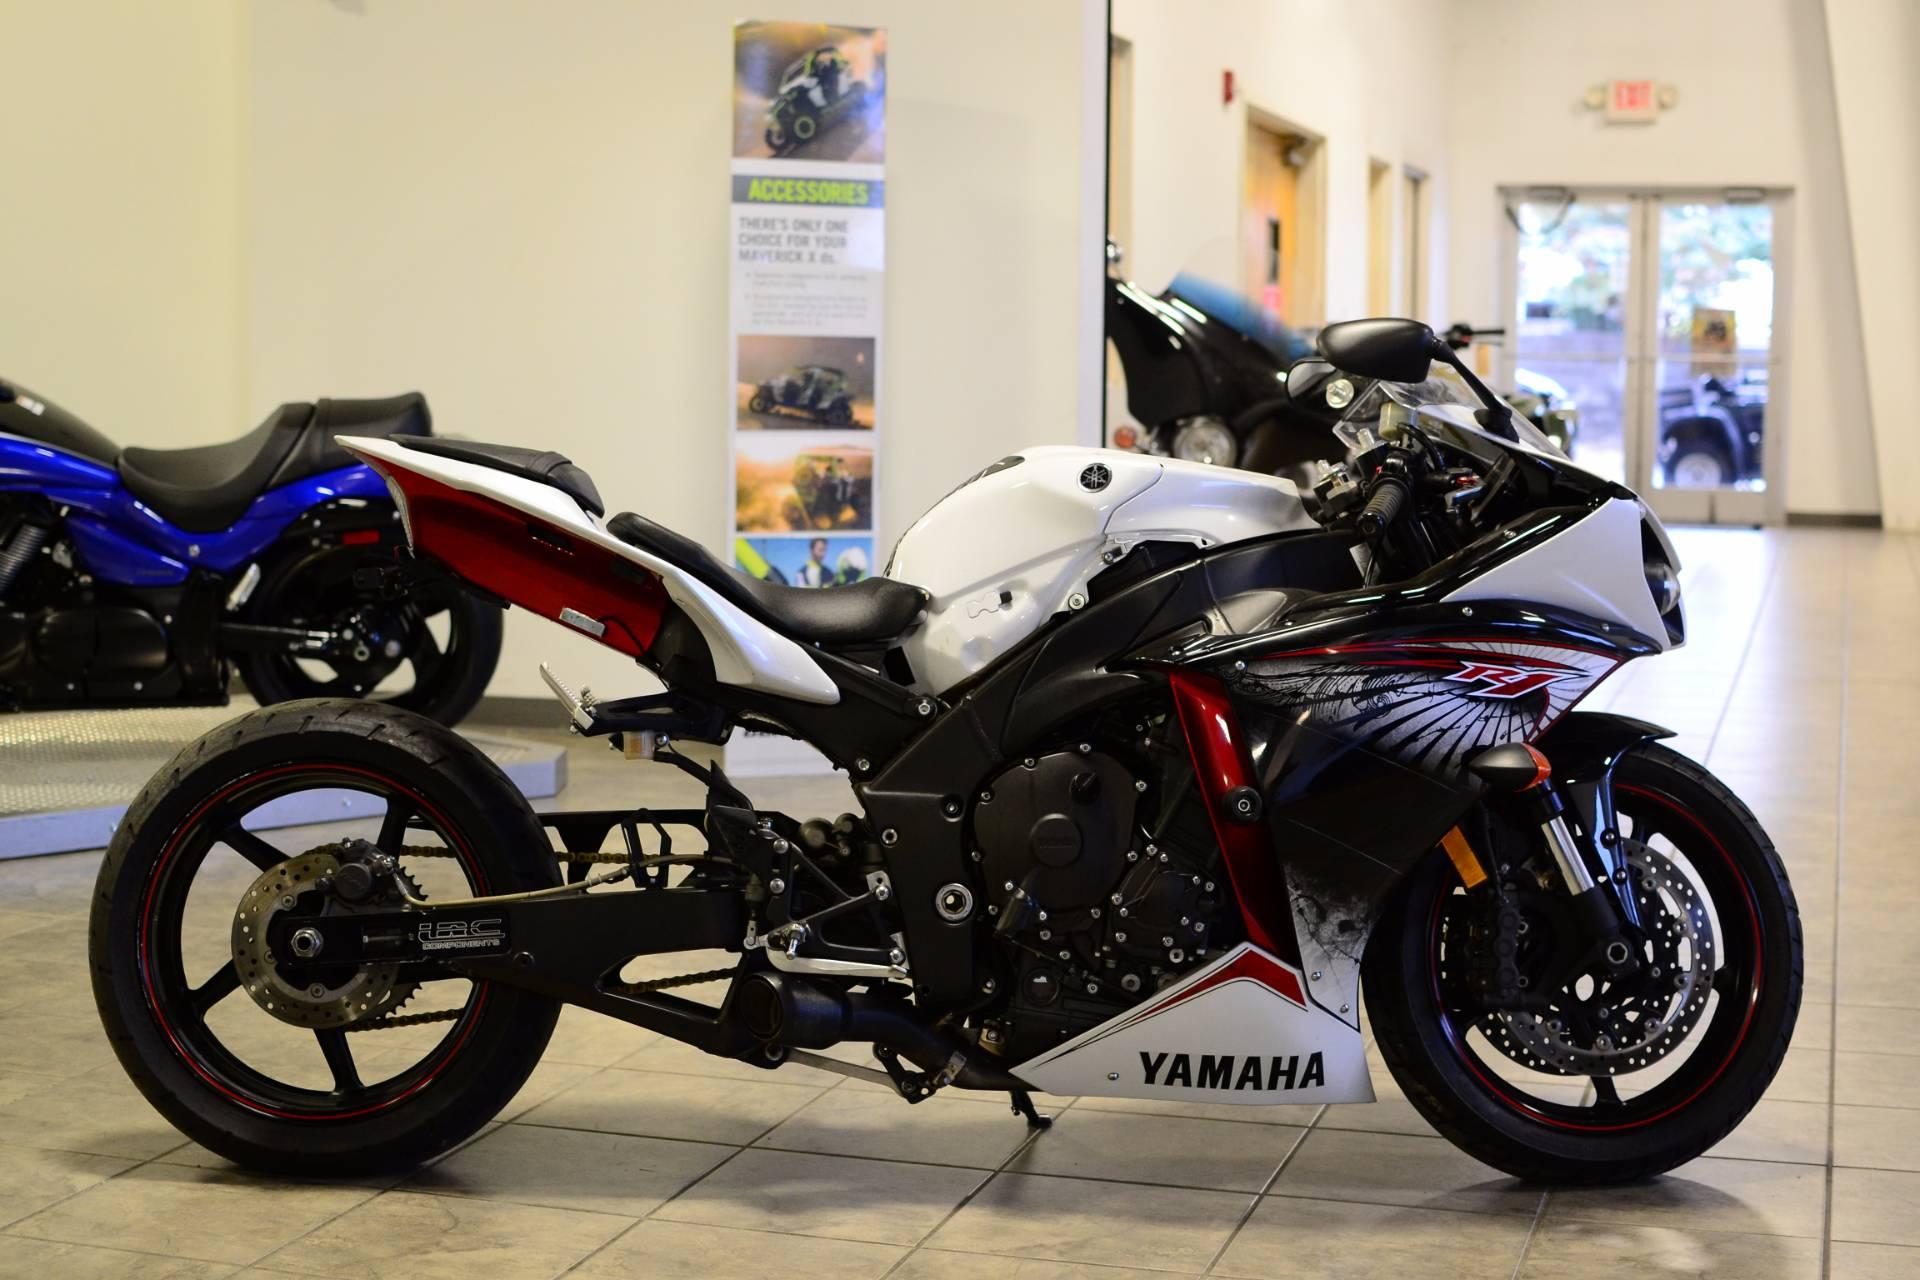 2012 Yamaha YZF-R1 2